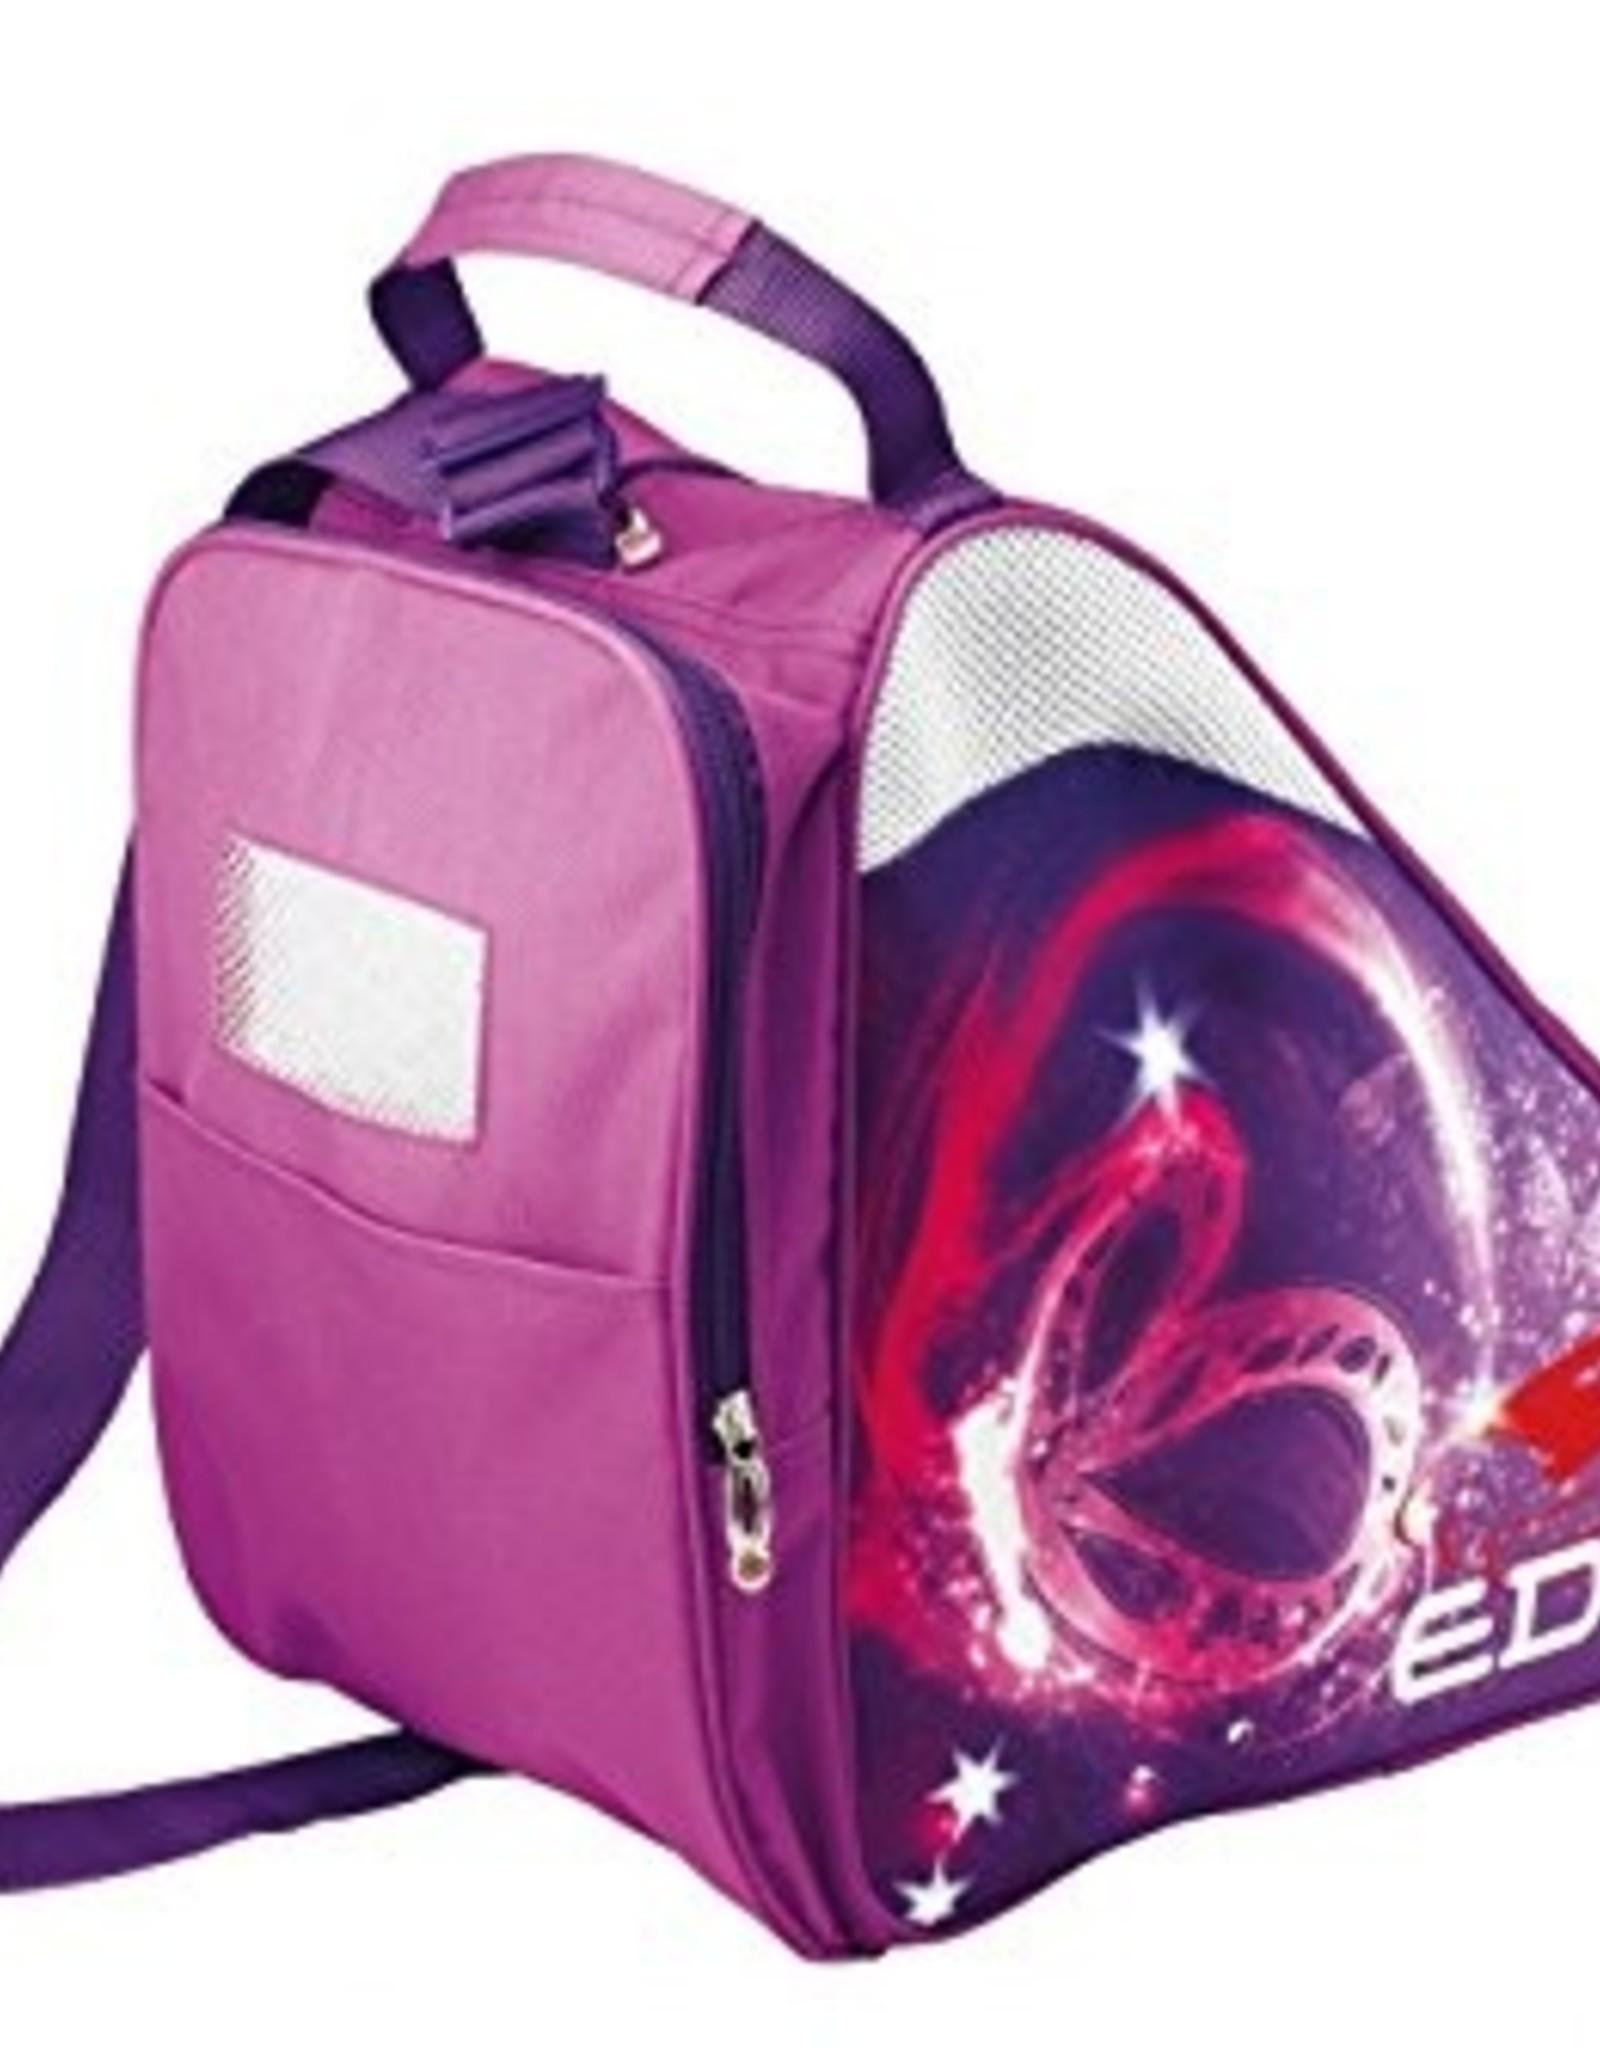 Edea Bag Skate Mariposa